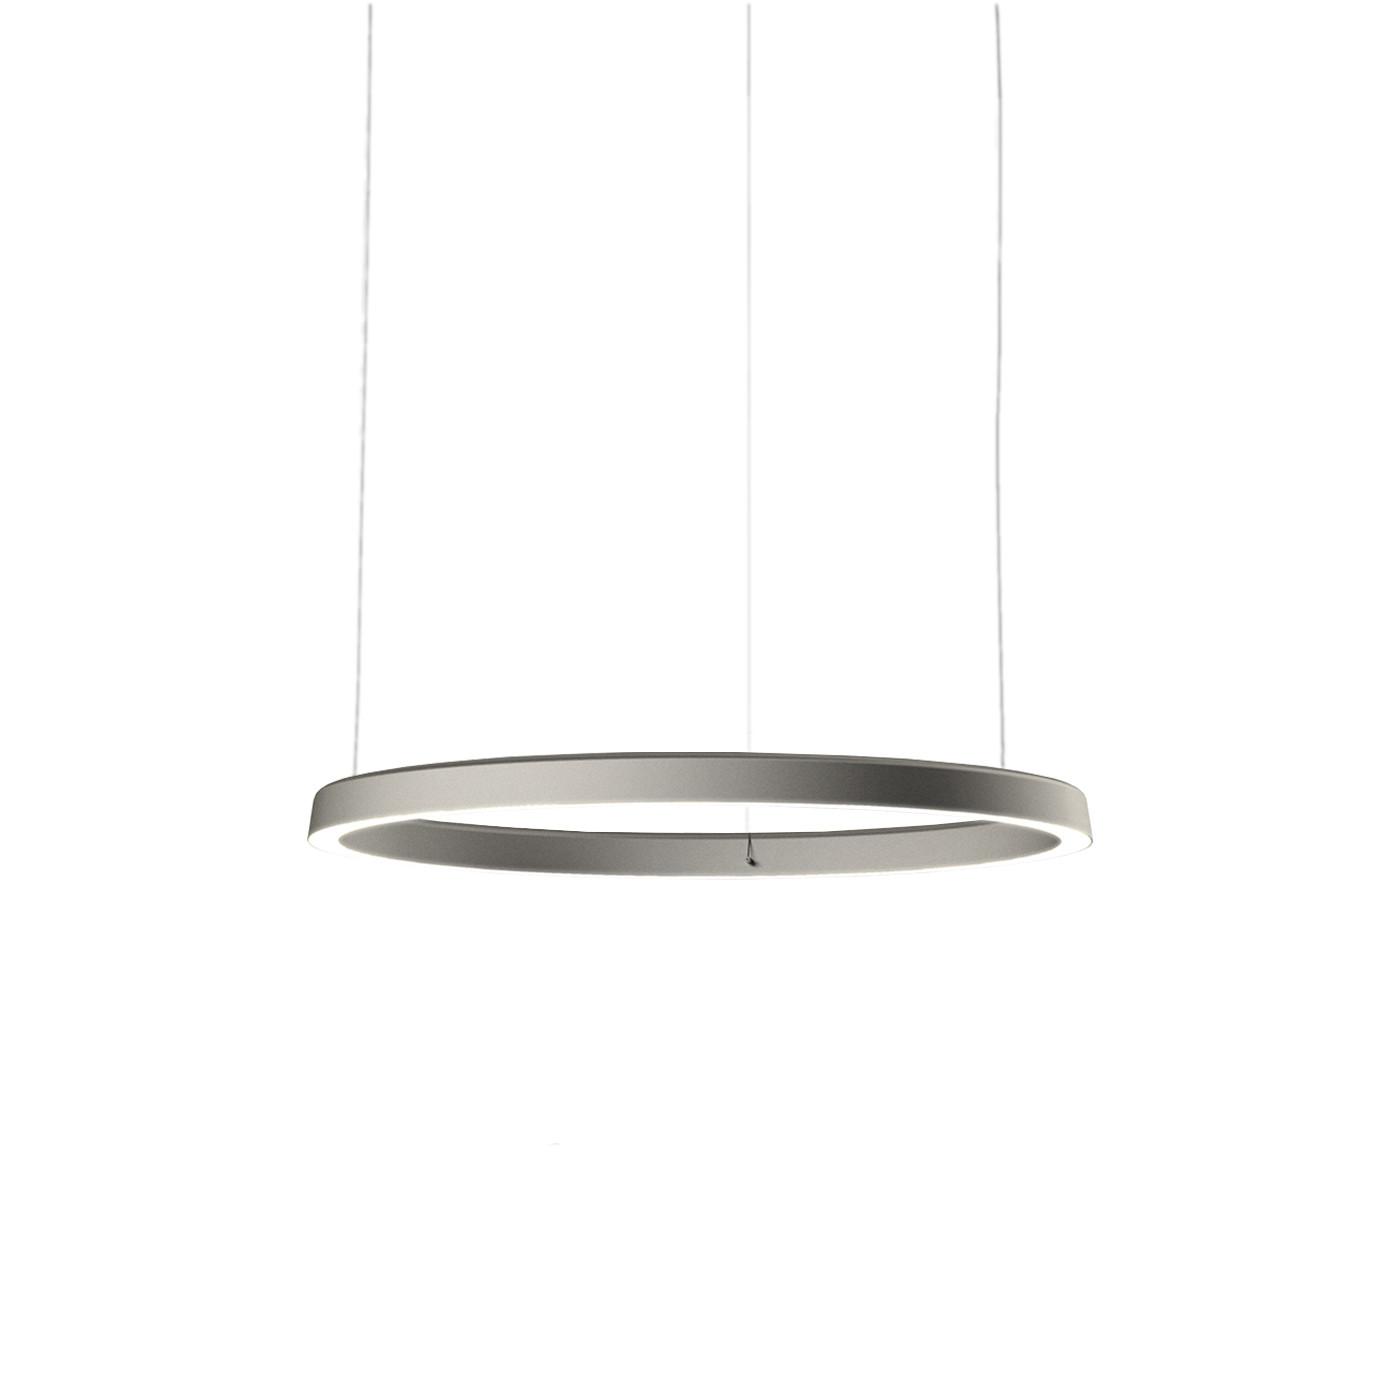 Luceplan Compendium Circle 110 LED